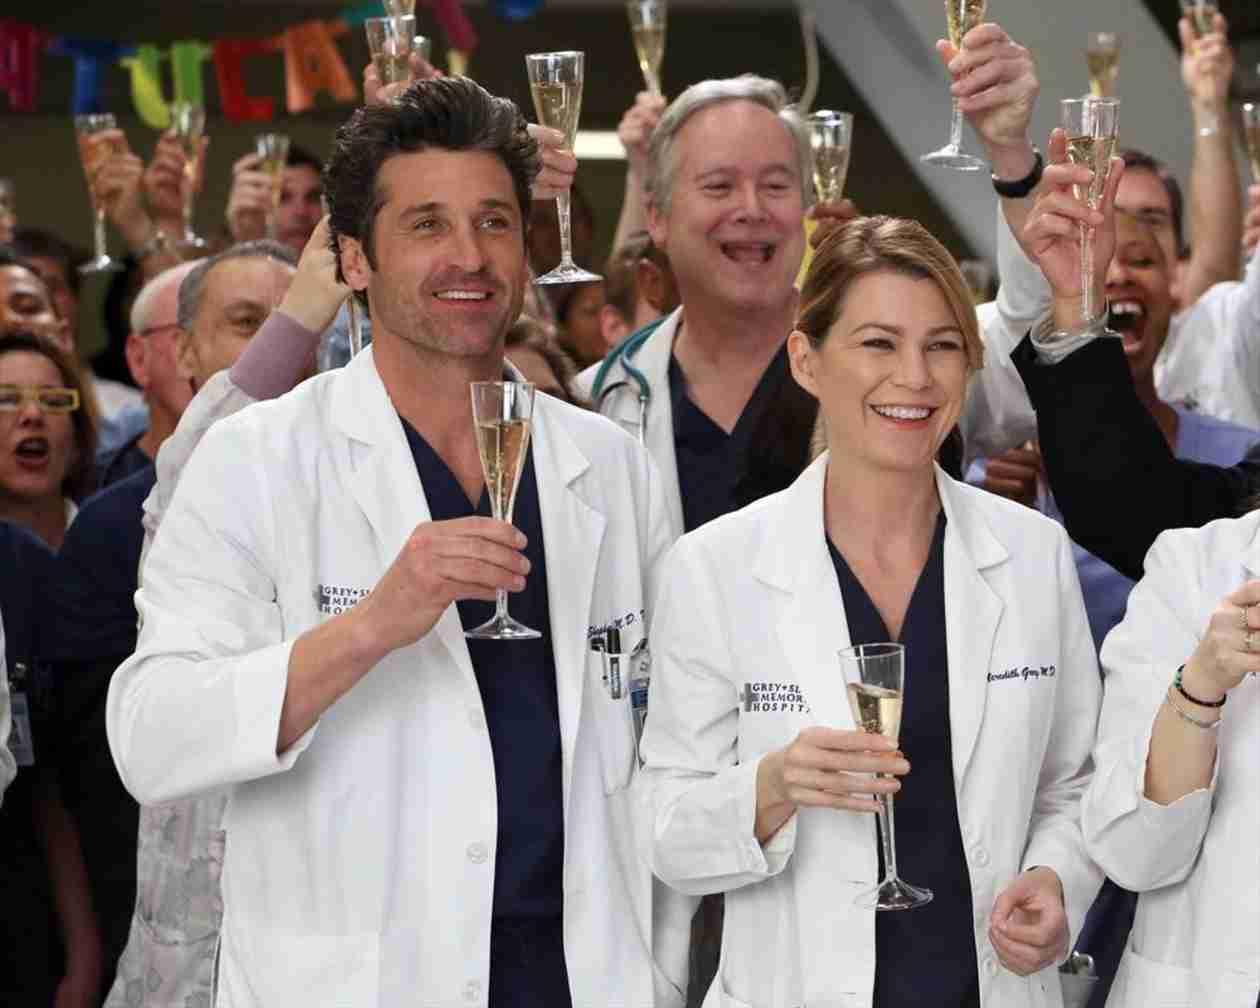 Grey's Anatomy: When Does Season 11 Premiere?